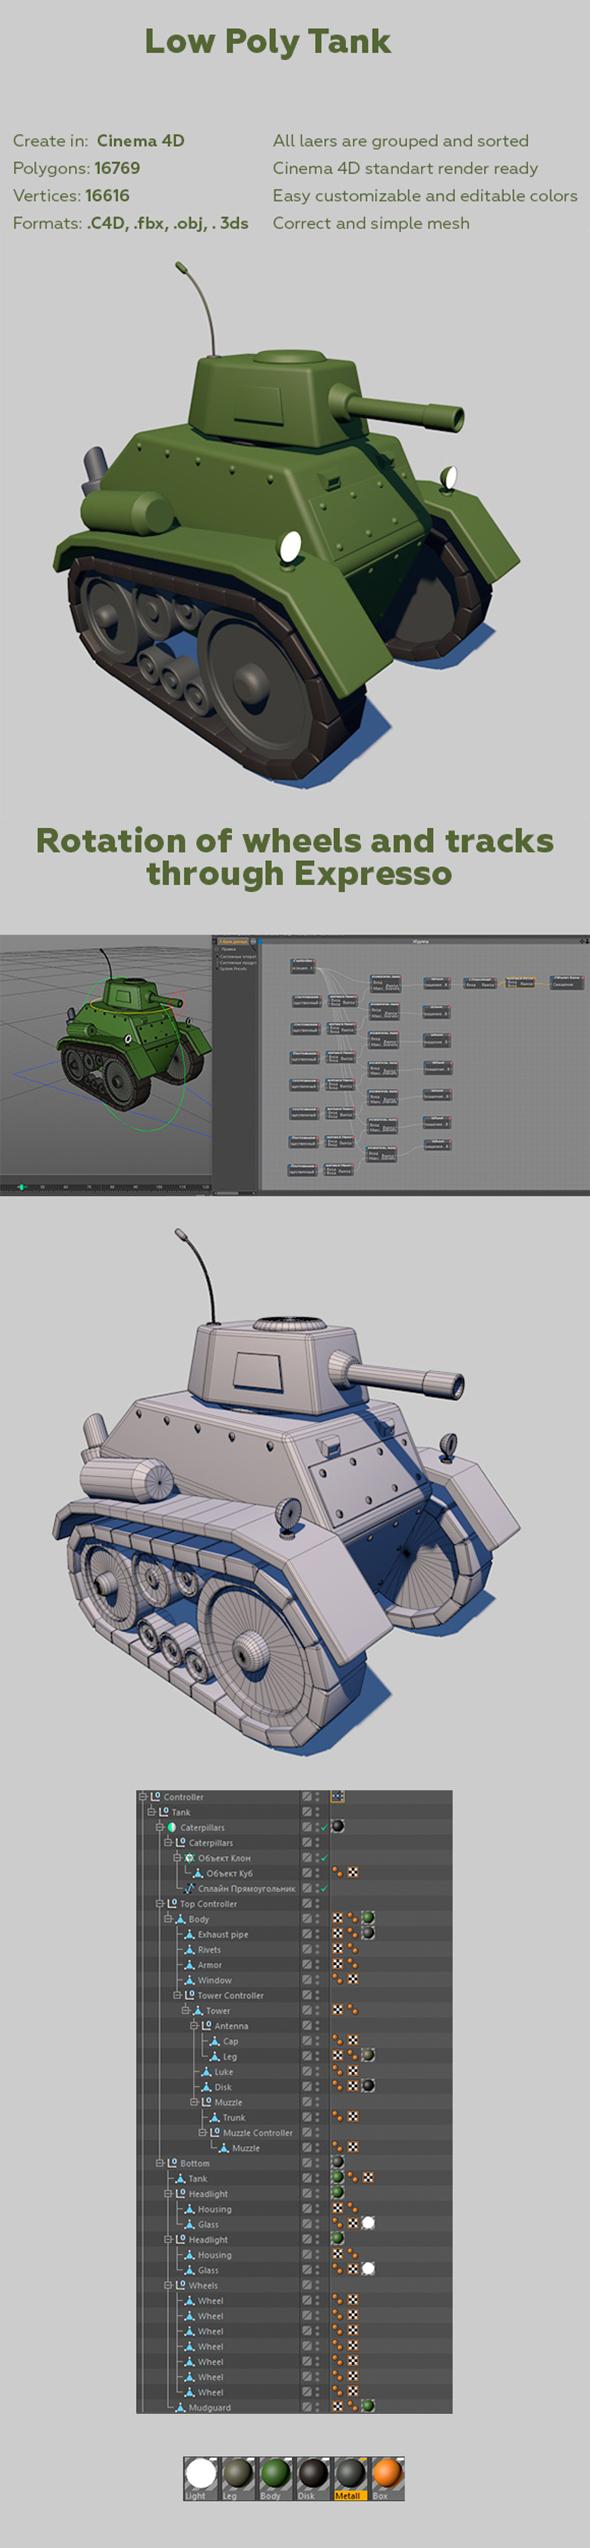 Low Poly Tank